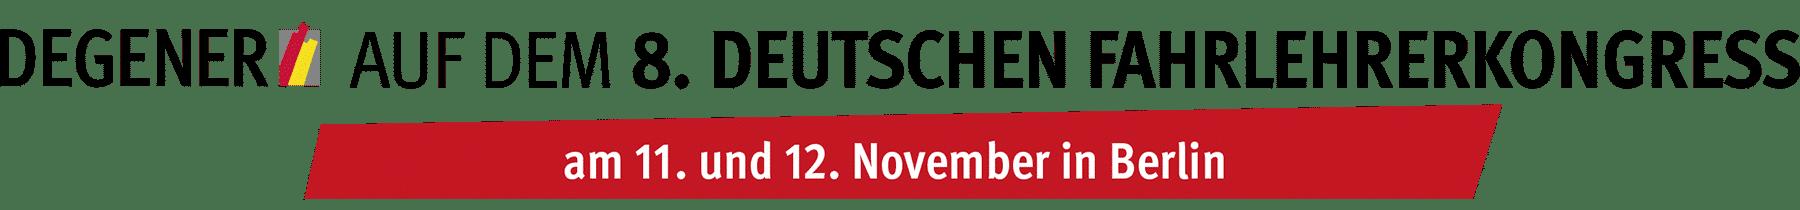 8. Deutscher Fahrlehrerkongress 2021 Berlin